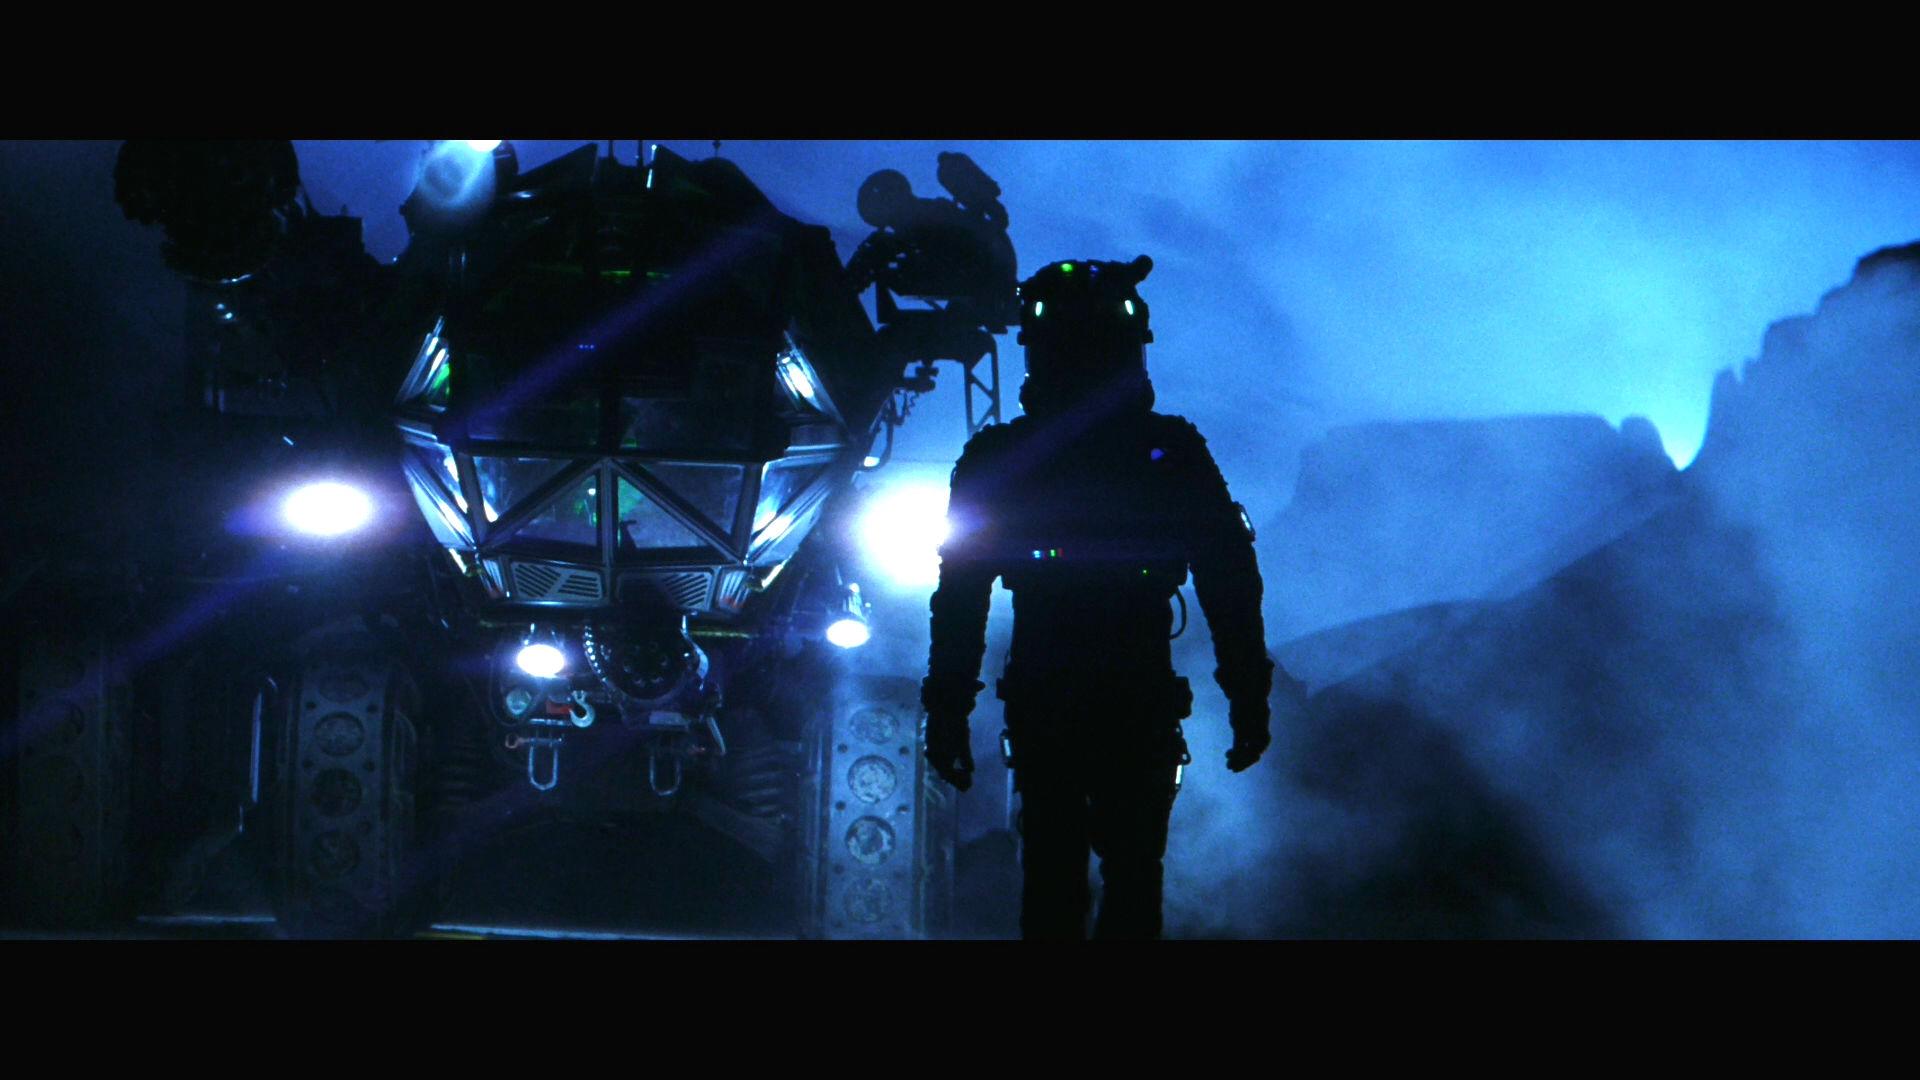 Wallpaper download action - Armageddon Action Adventure Sci Fi Astronaut D Wallpaper